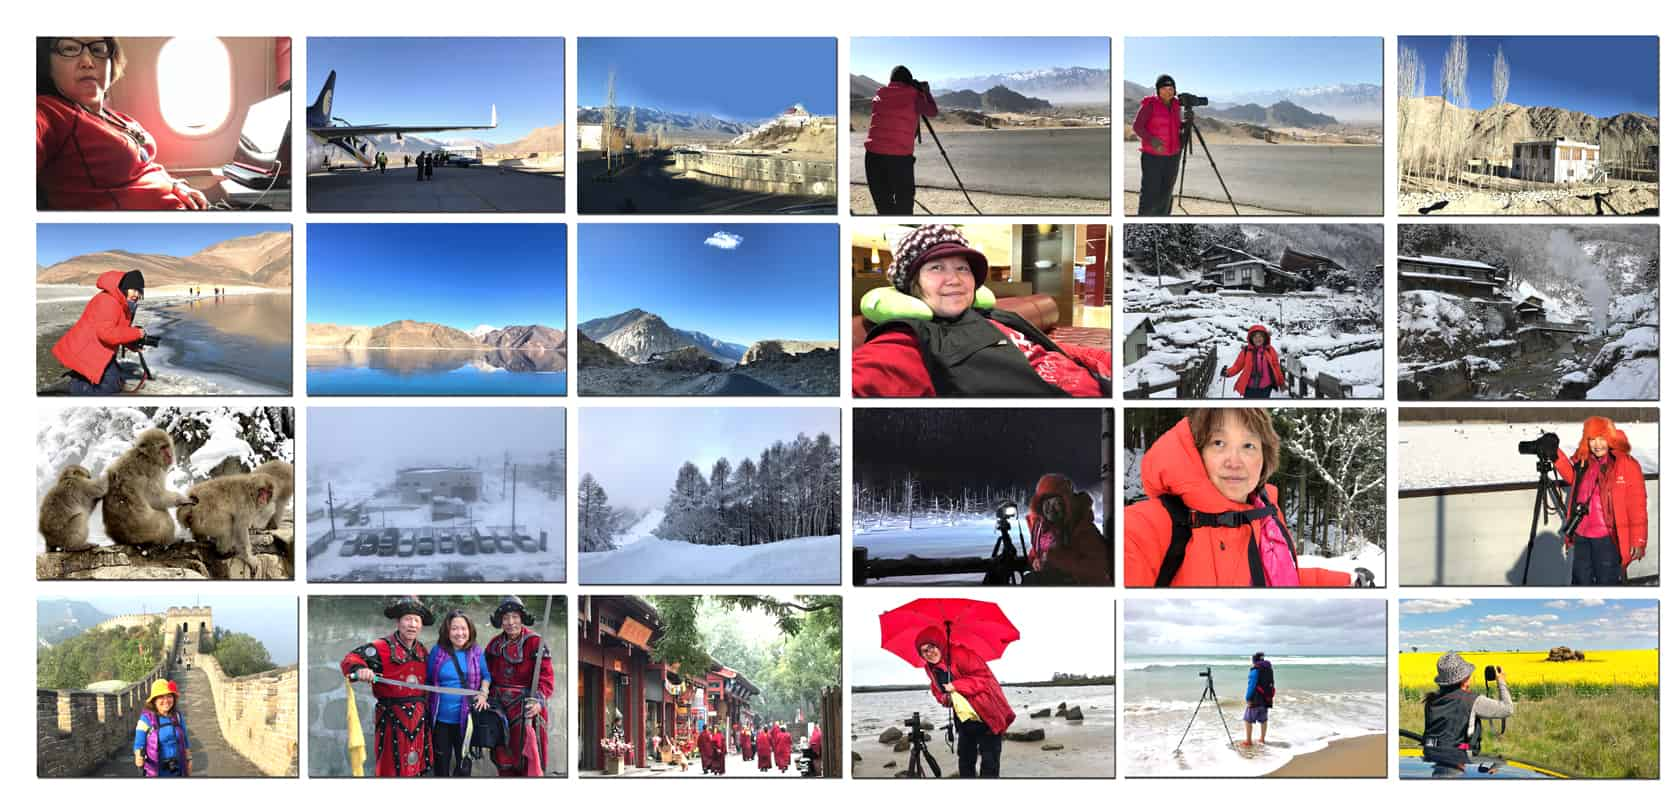 Ladakh,-Japan,-China TRAVEL POSTCARD- Dr Zenaidy Castro